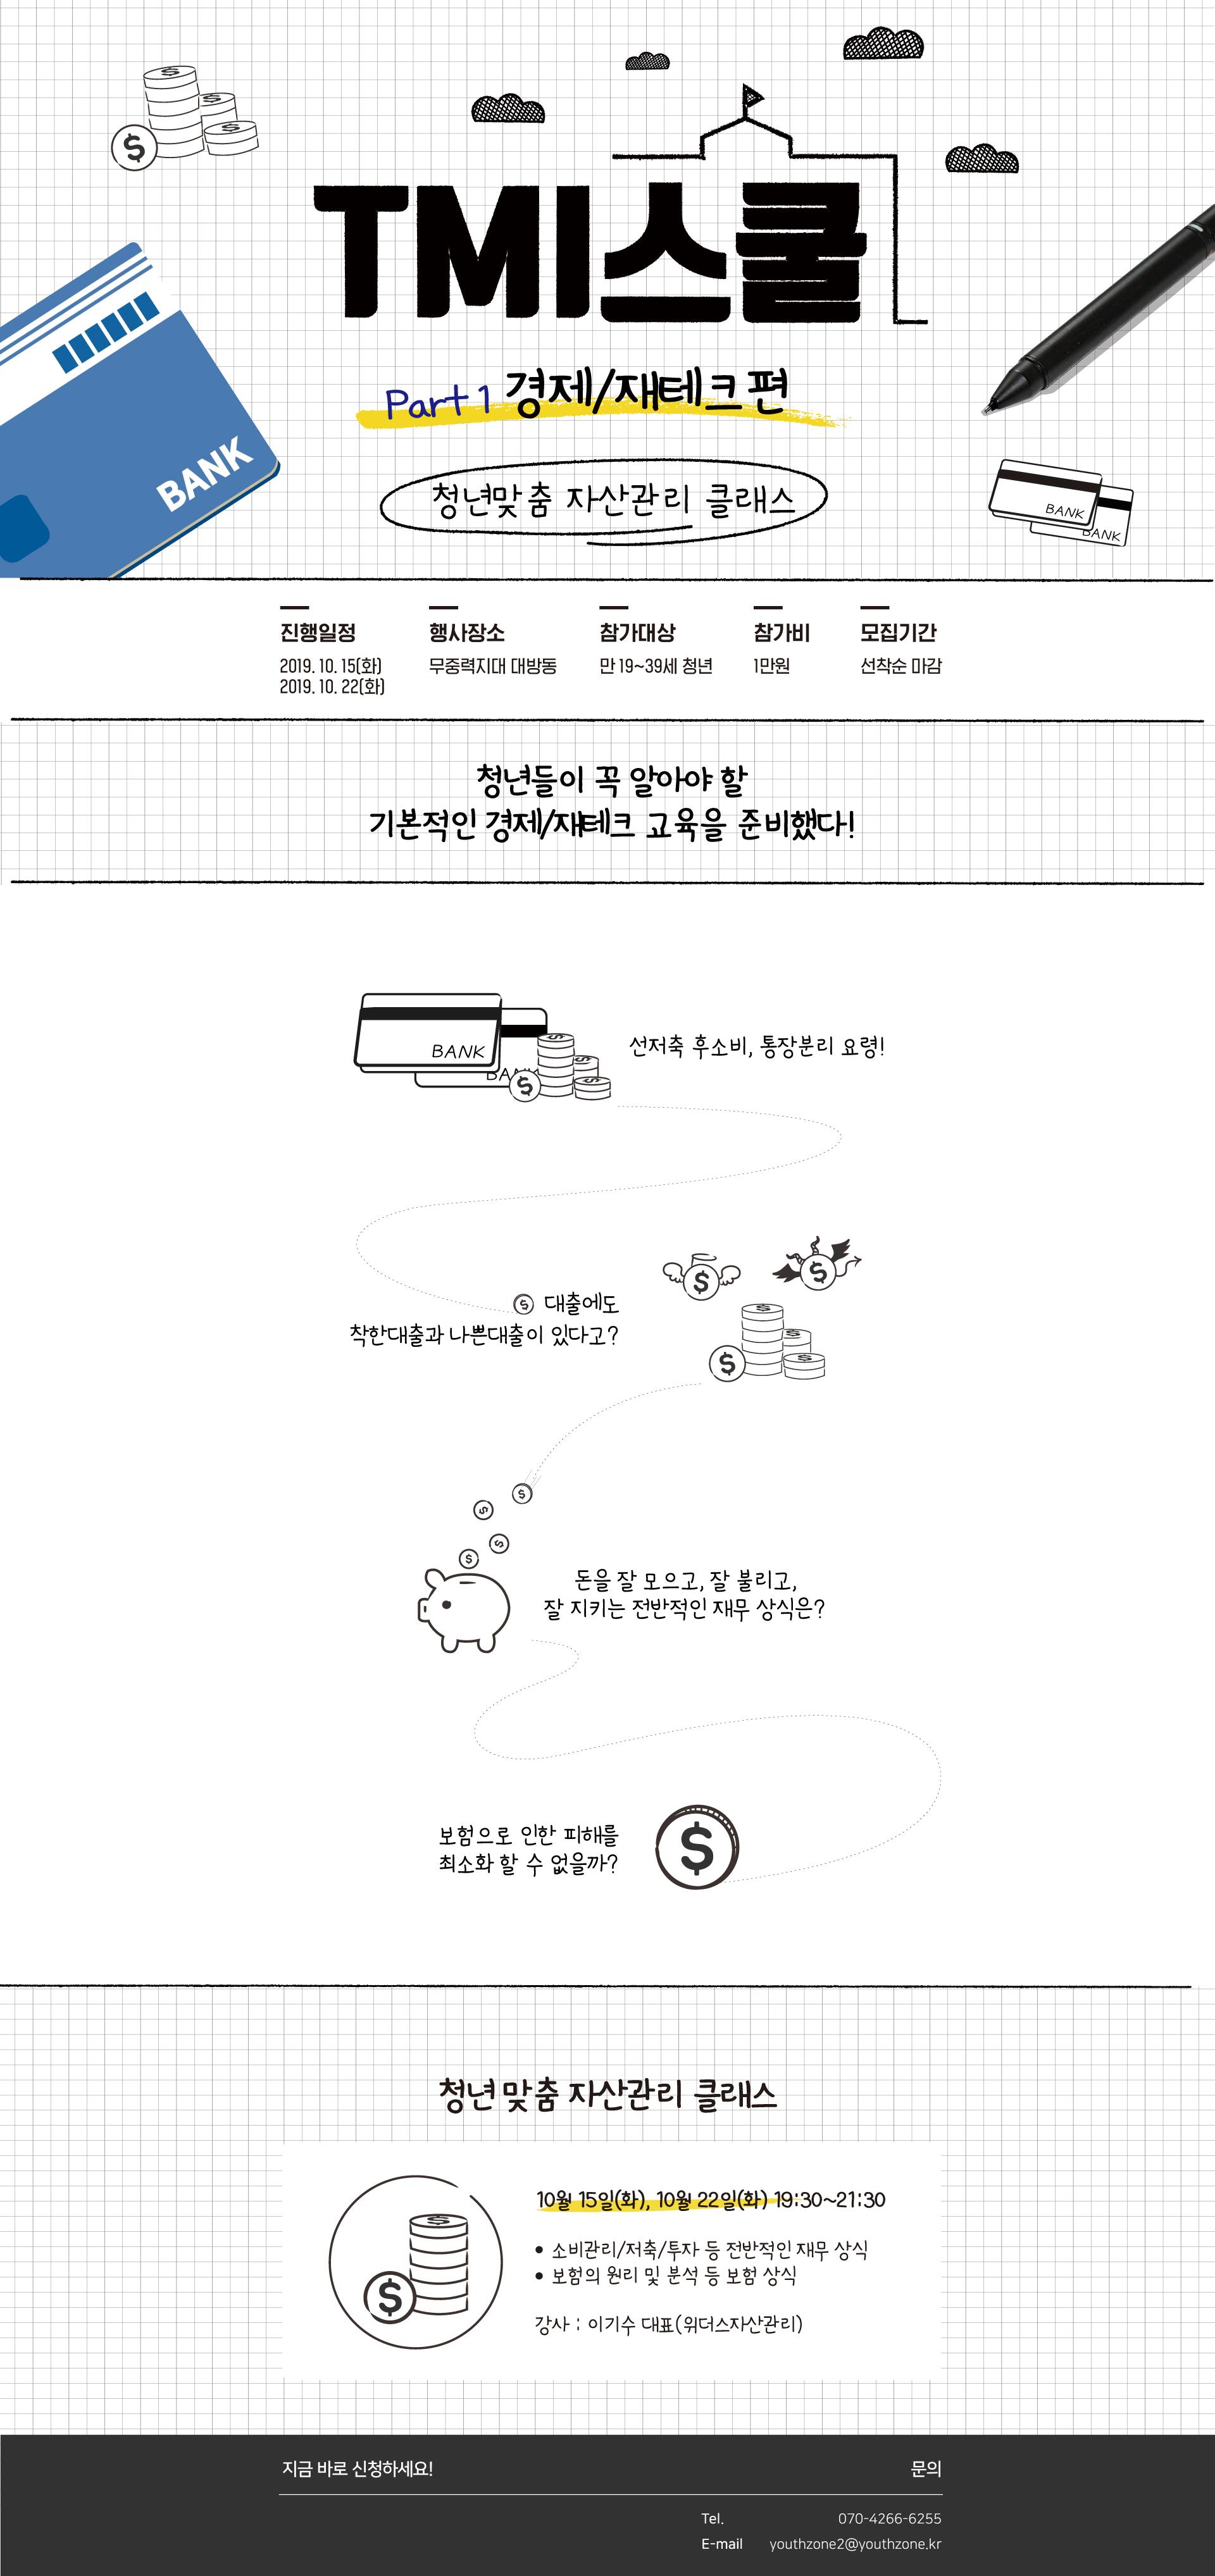 TMI스쿨 part2. 경제/재테크편_청년 맞춤 자산관리 클래스, 참가자 모집!